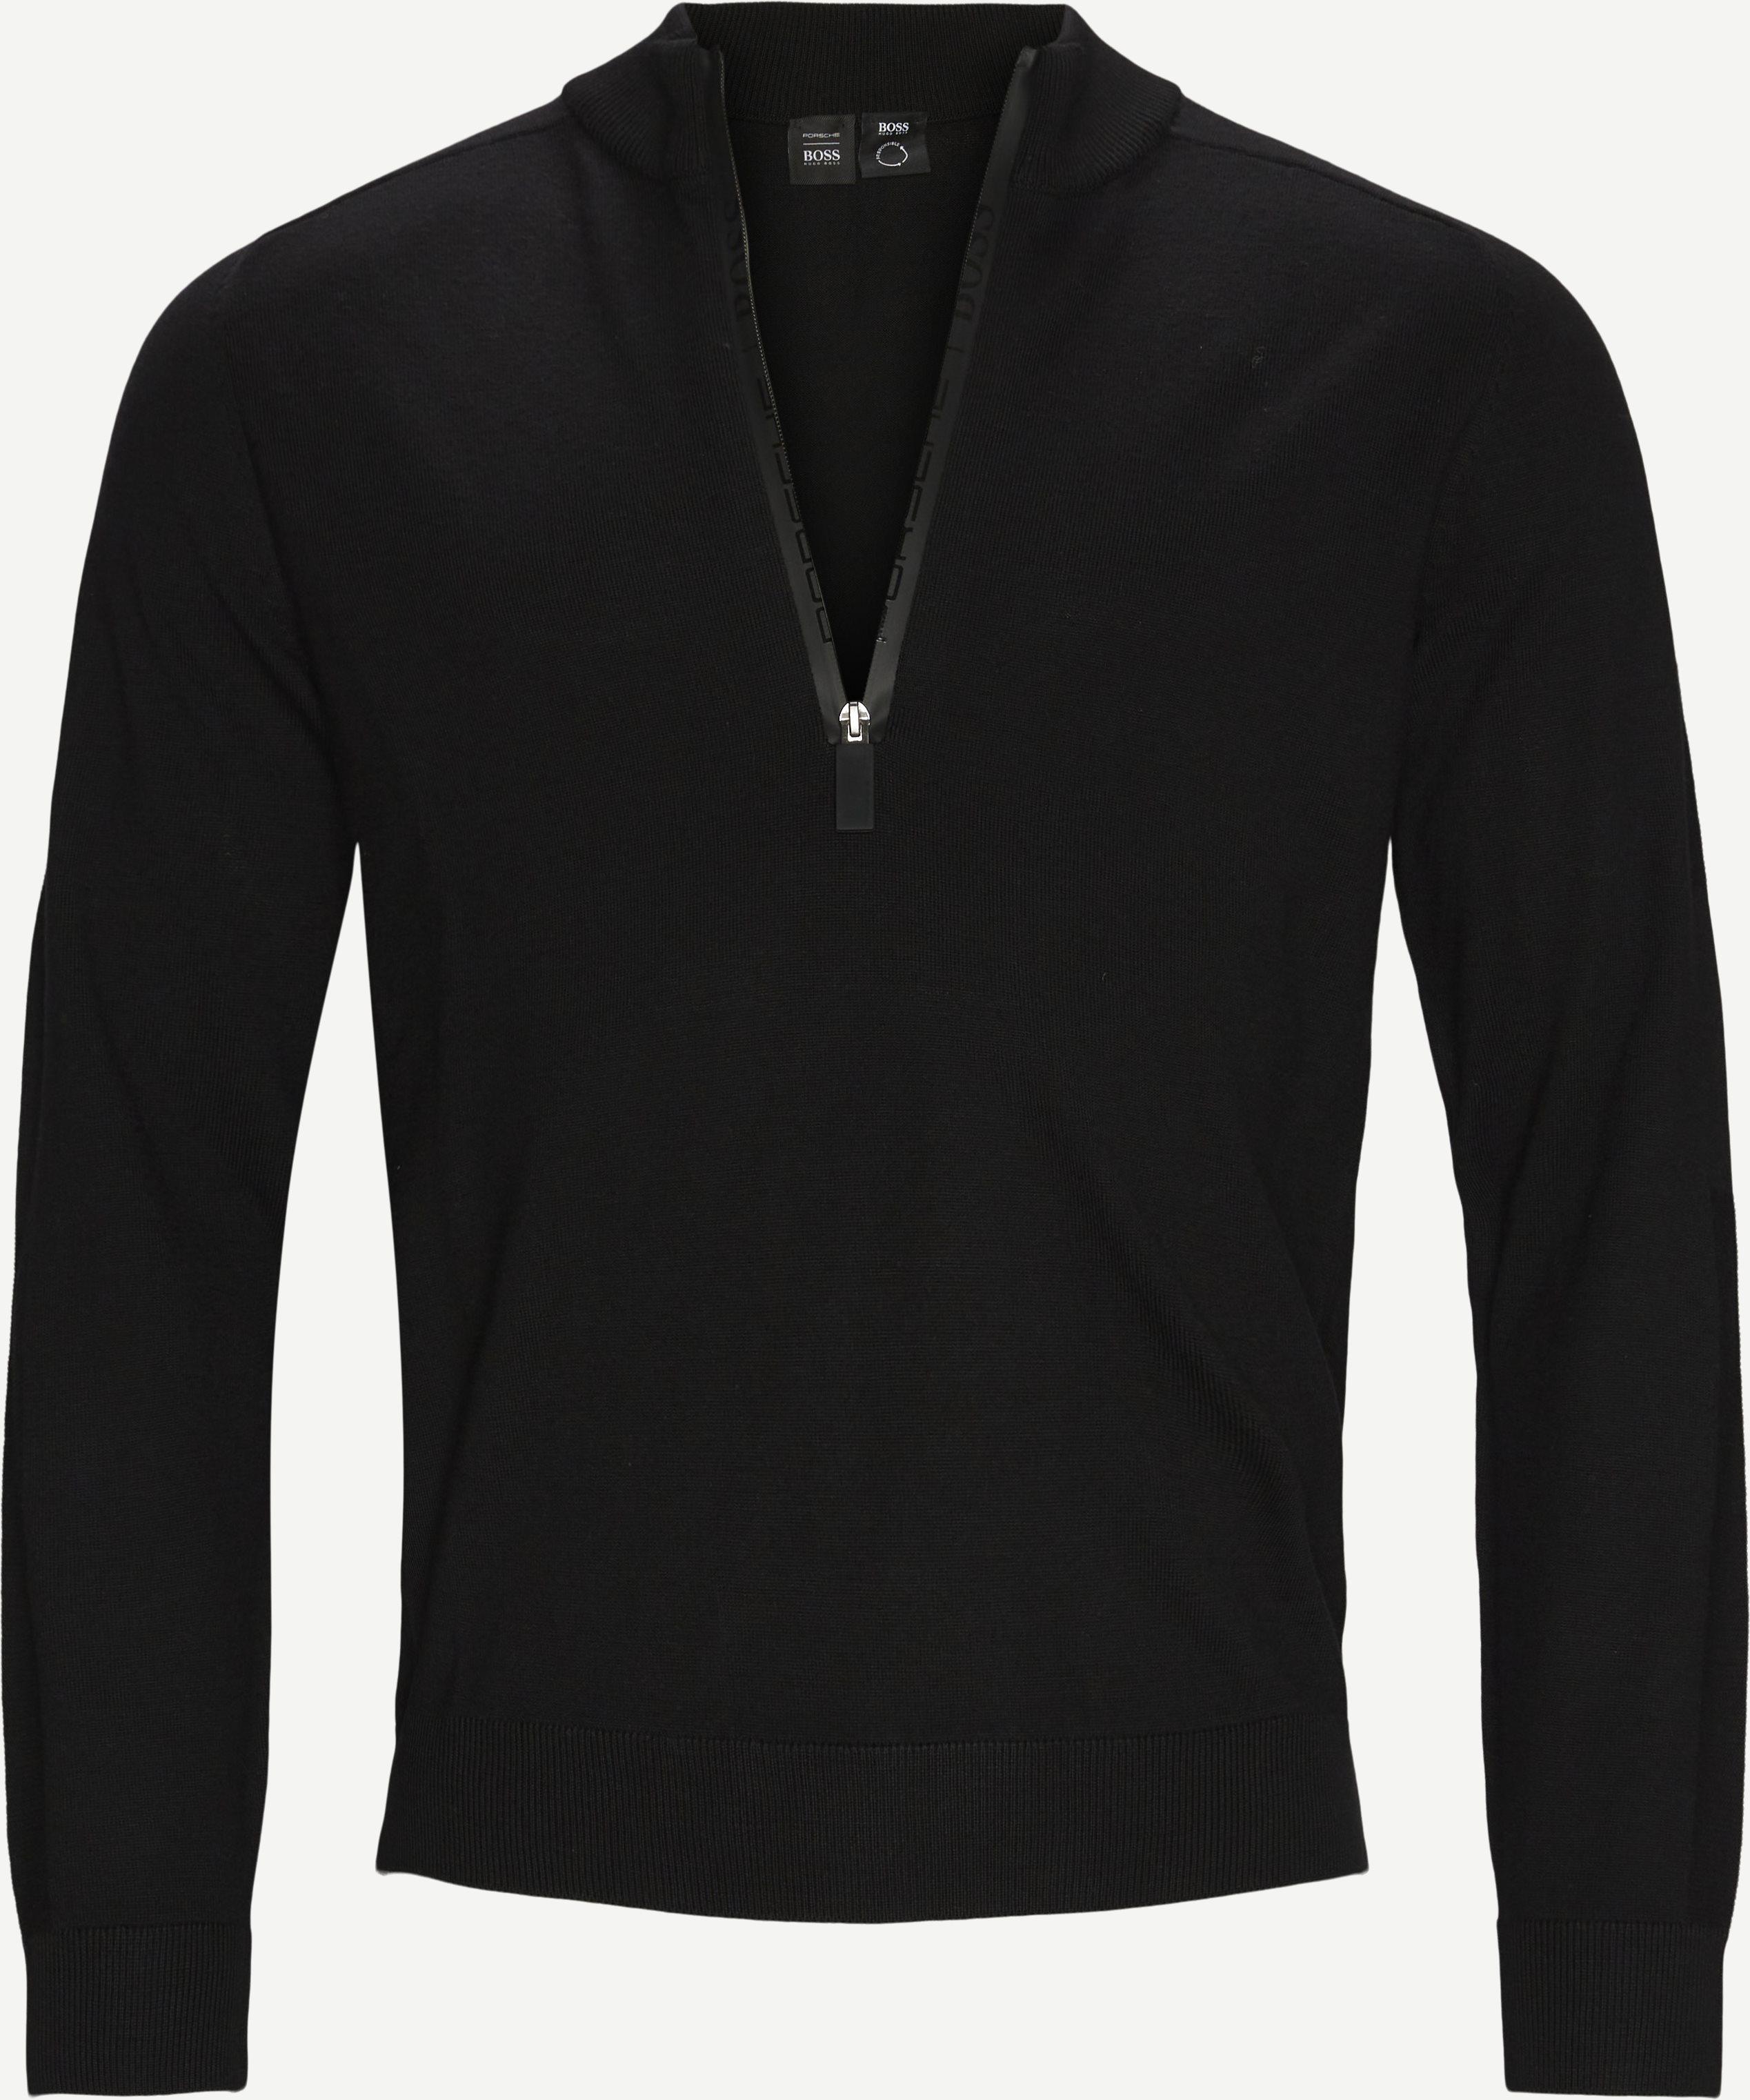 Strickwaren - Regular fit - Schwarz